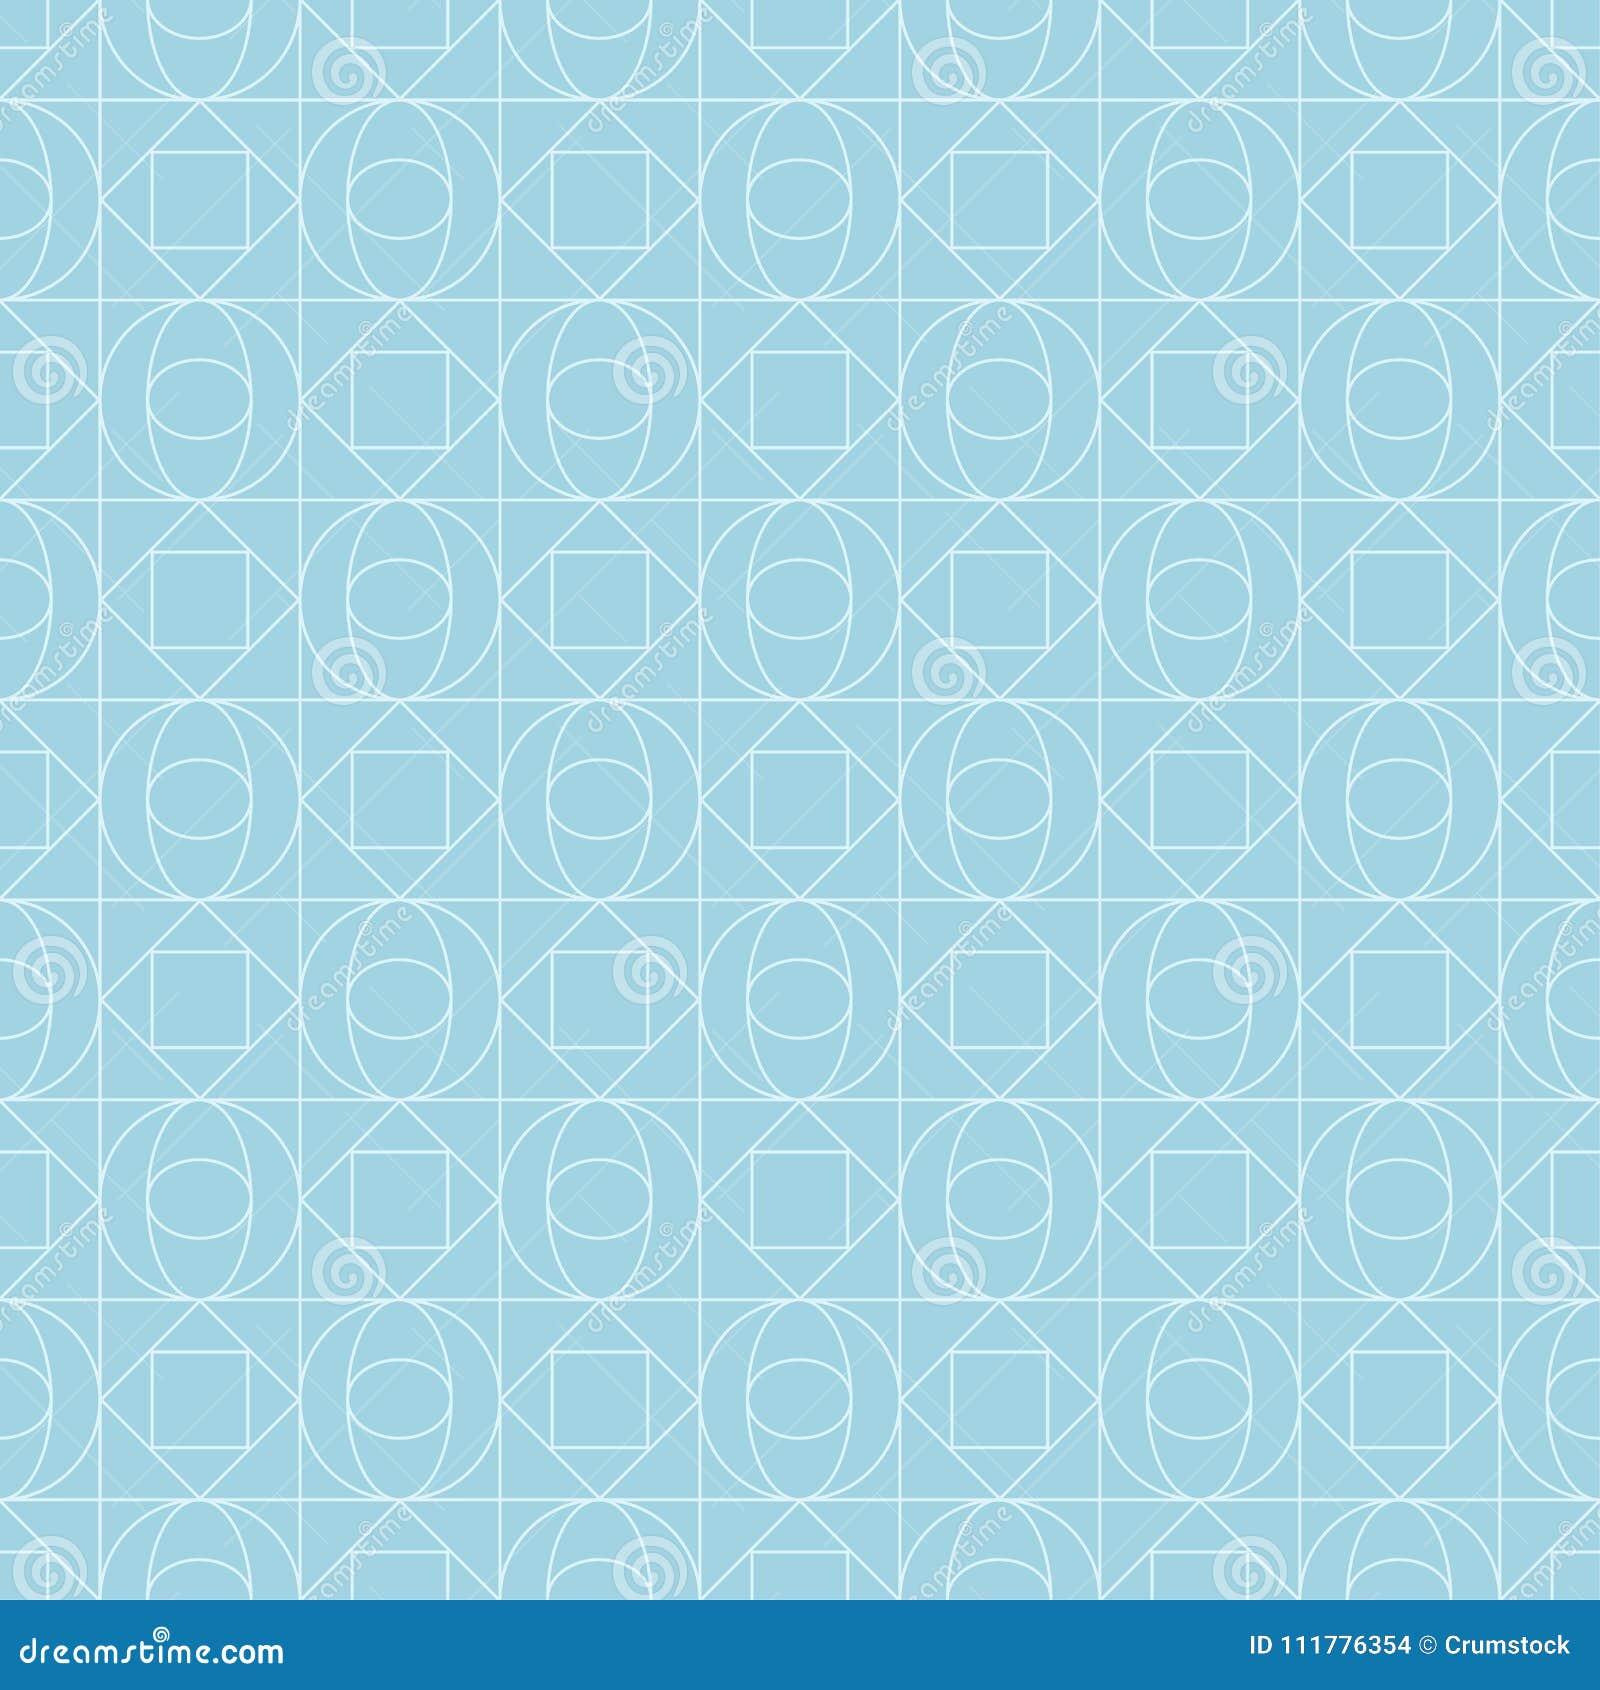 Light blue geometric print. Seamless pattern